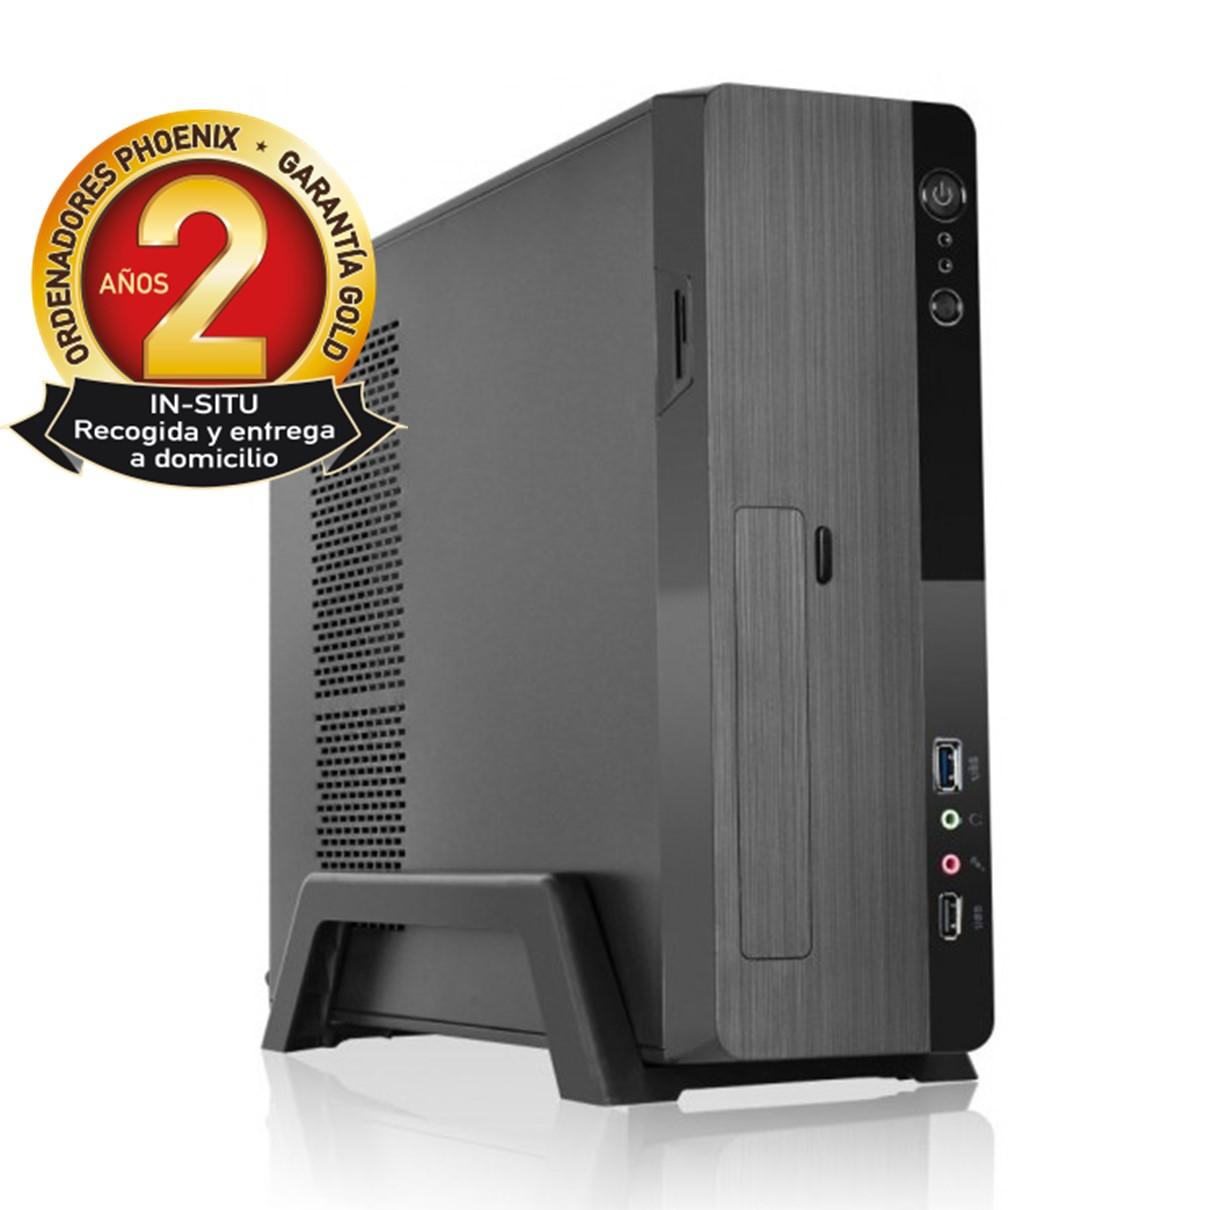 ORDENADOR PHOENIX ZITY AMD RYZEN 3 3200G 8GB DDR4 480 GB SSD MICRO ATX SLIM  PC SOBREMESA